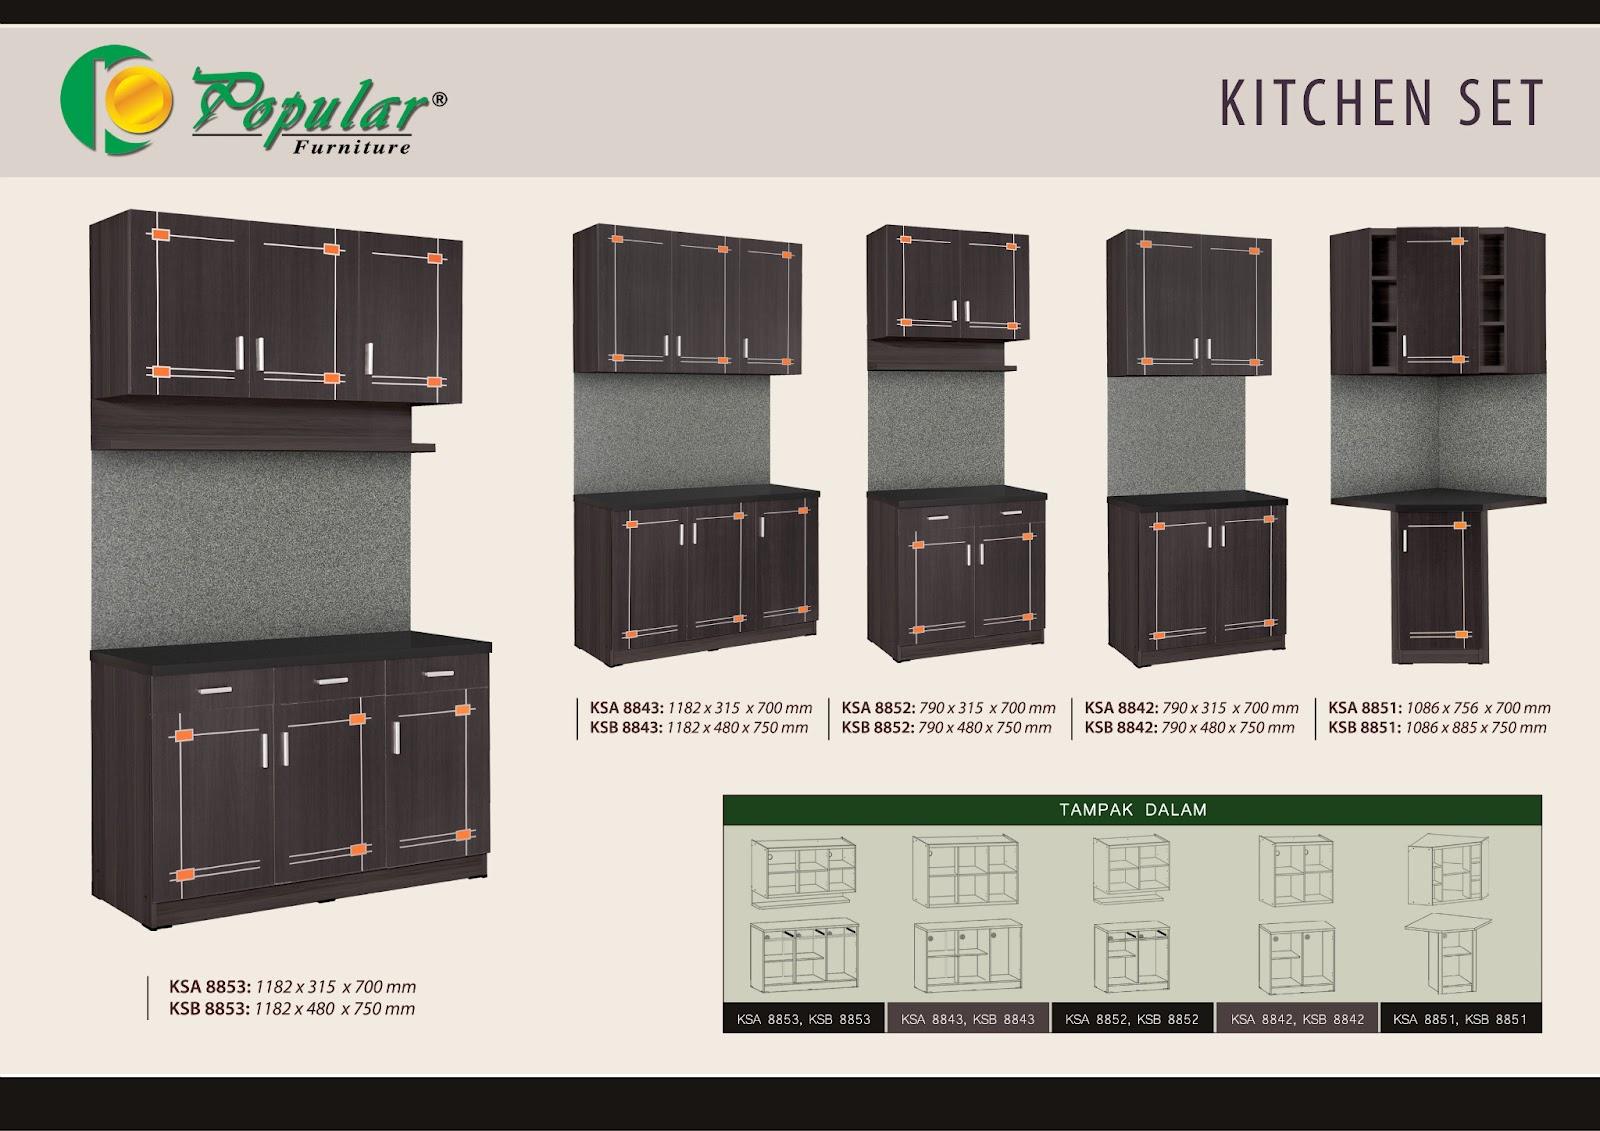 Kitchen set lemari sayur lemari pakaian murah for Daftar harga kitchen set